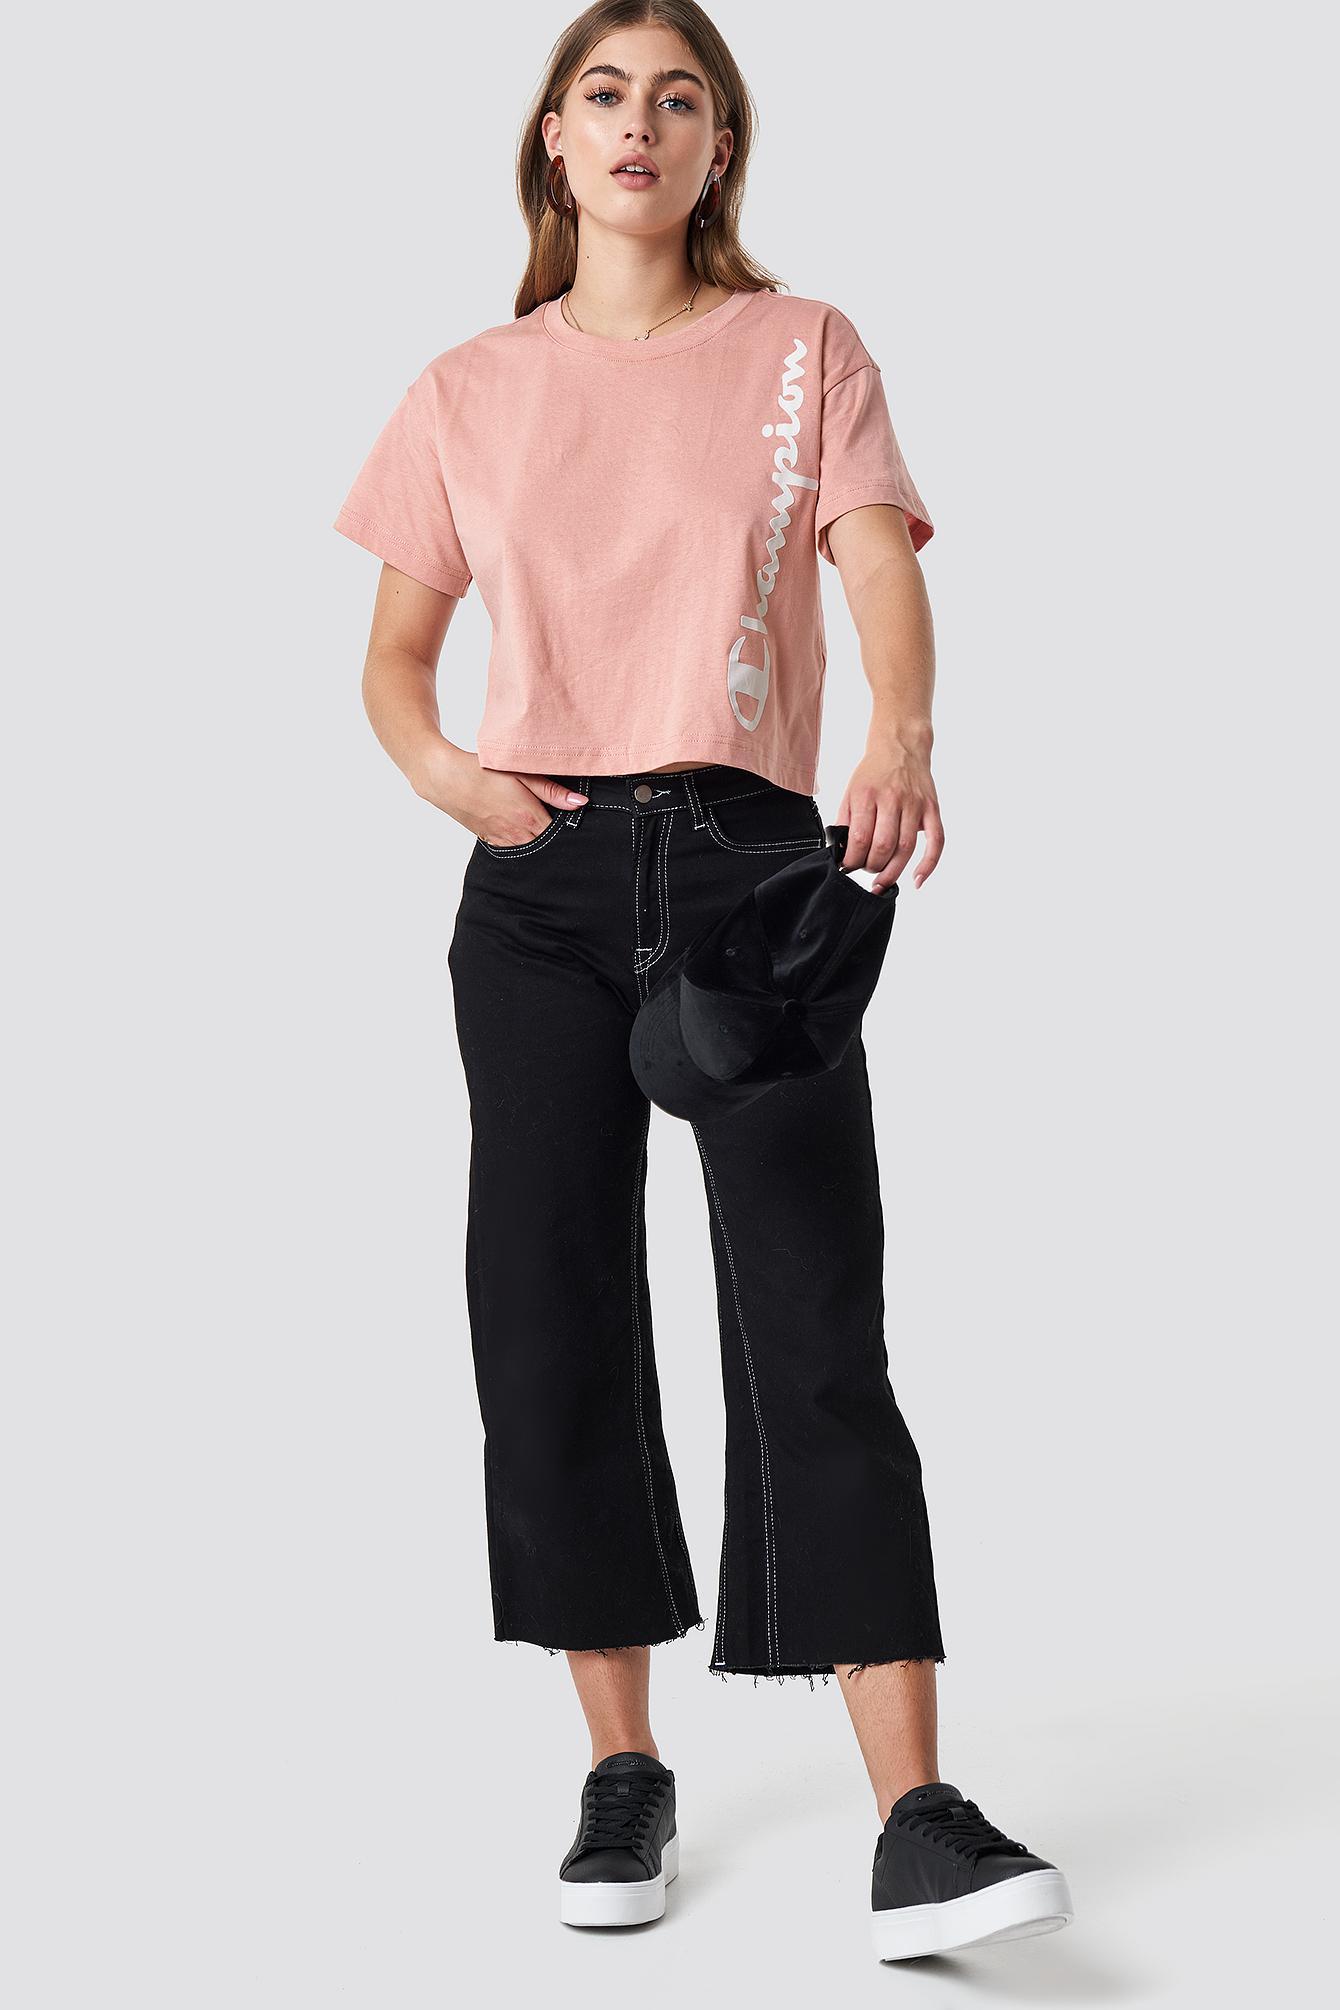 929ba2d0c214 Lyst - Champion Crewneck Crop Top Rose Tan in Pink